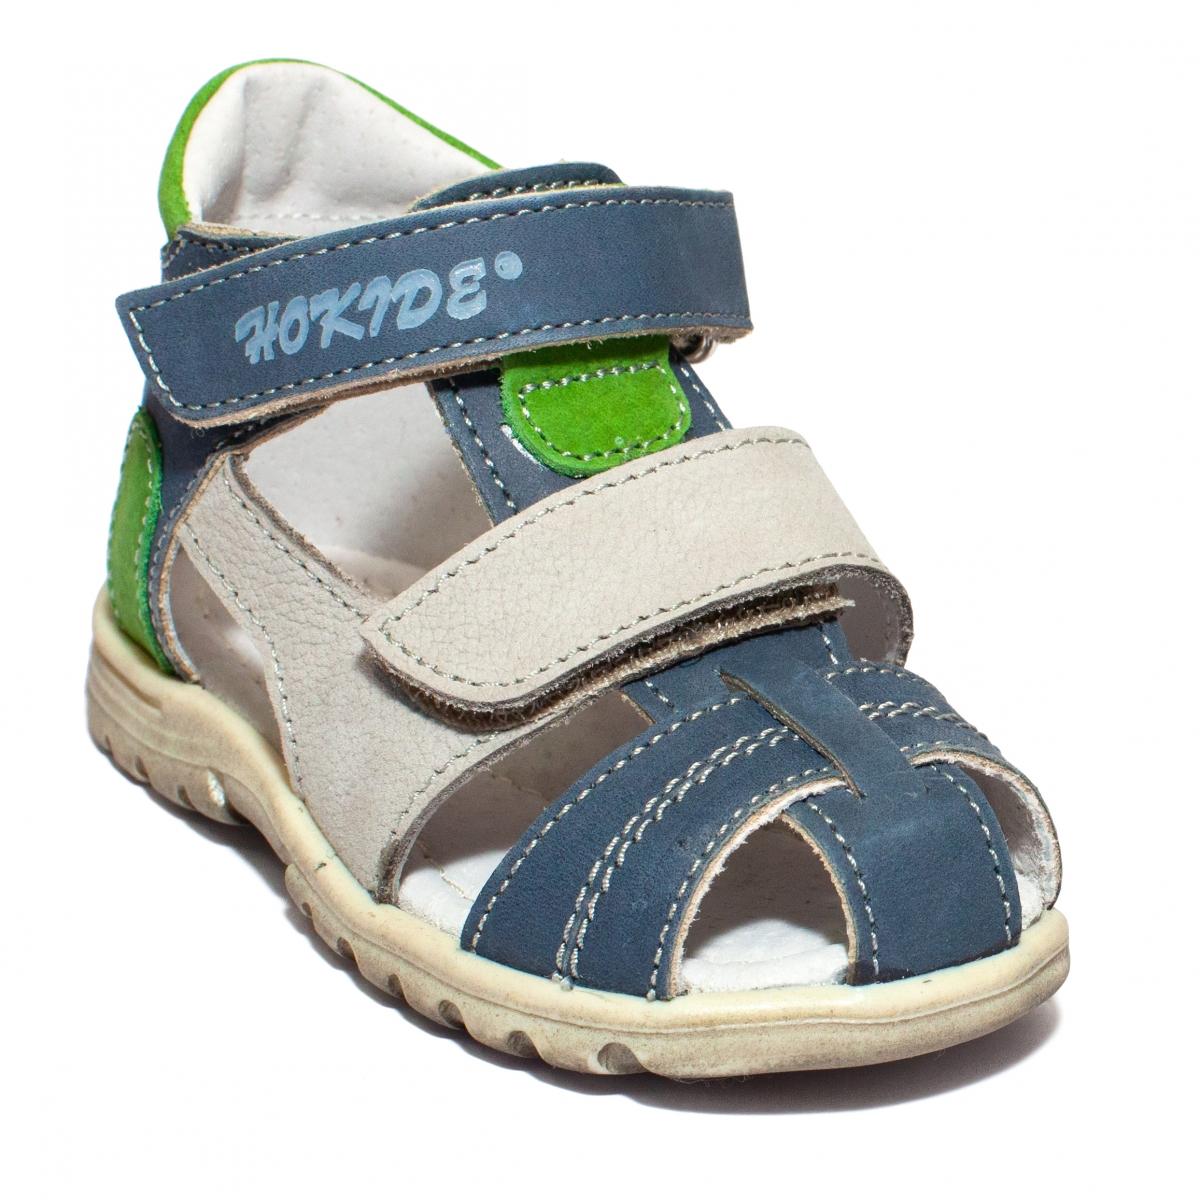 Sandale baieti picior lat hokide 405 albastru gri verde 18-27